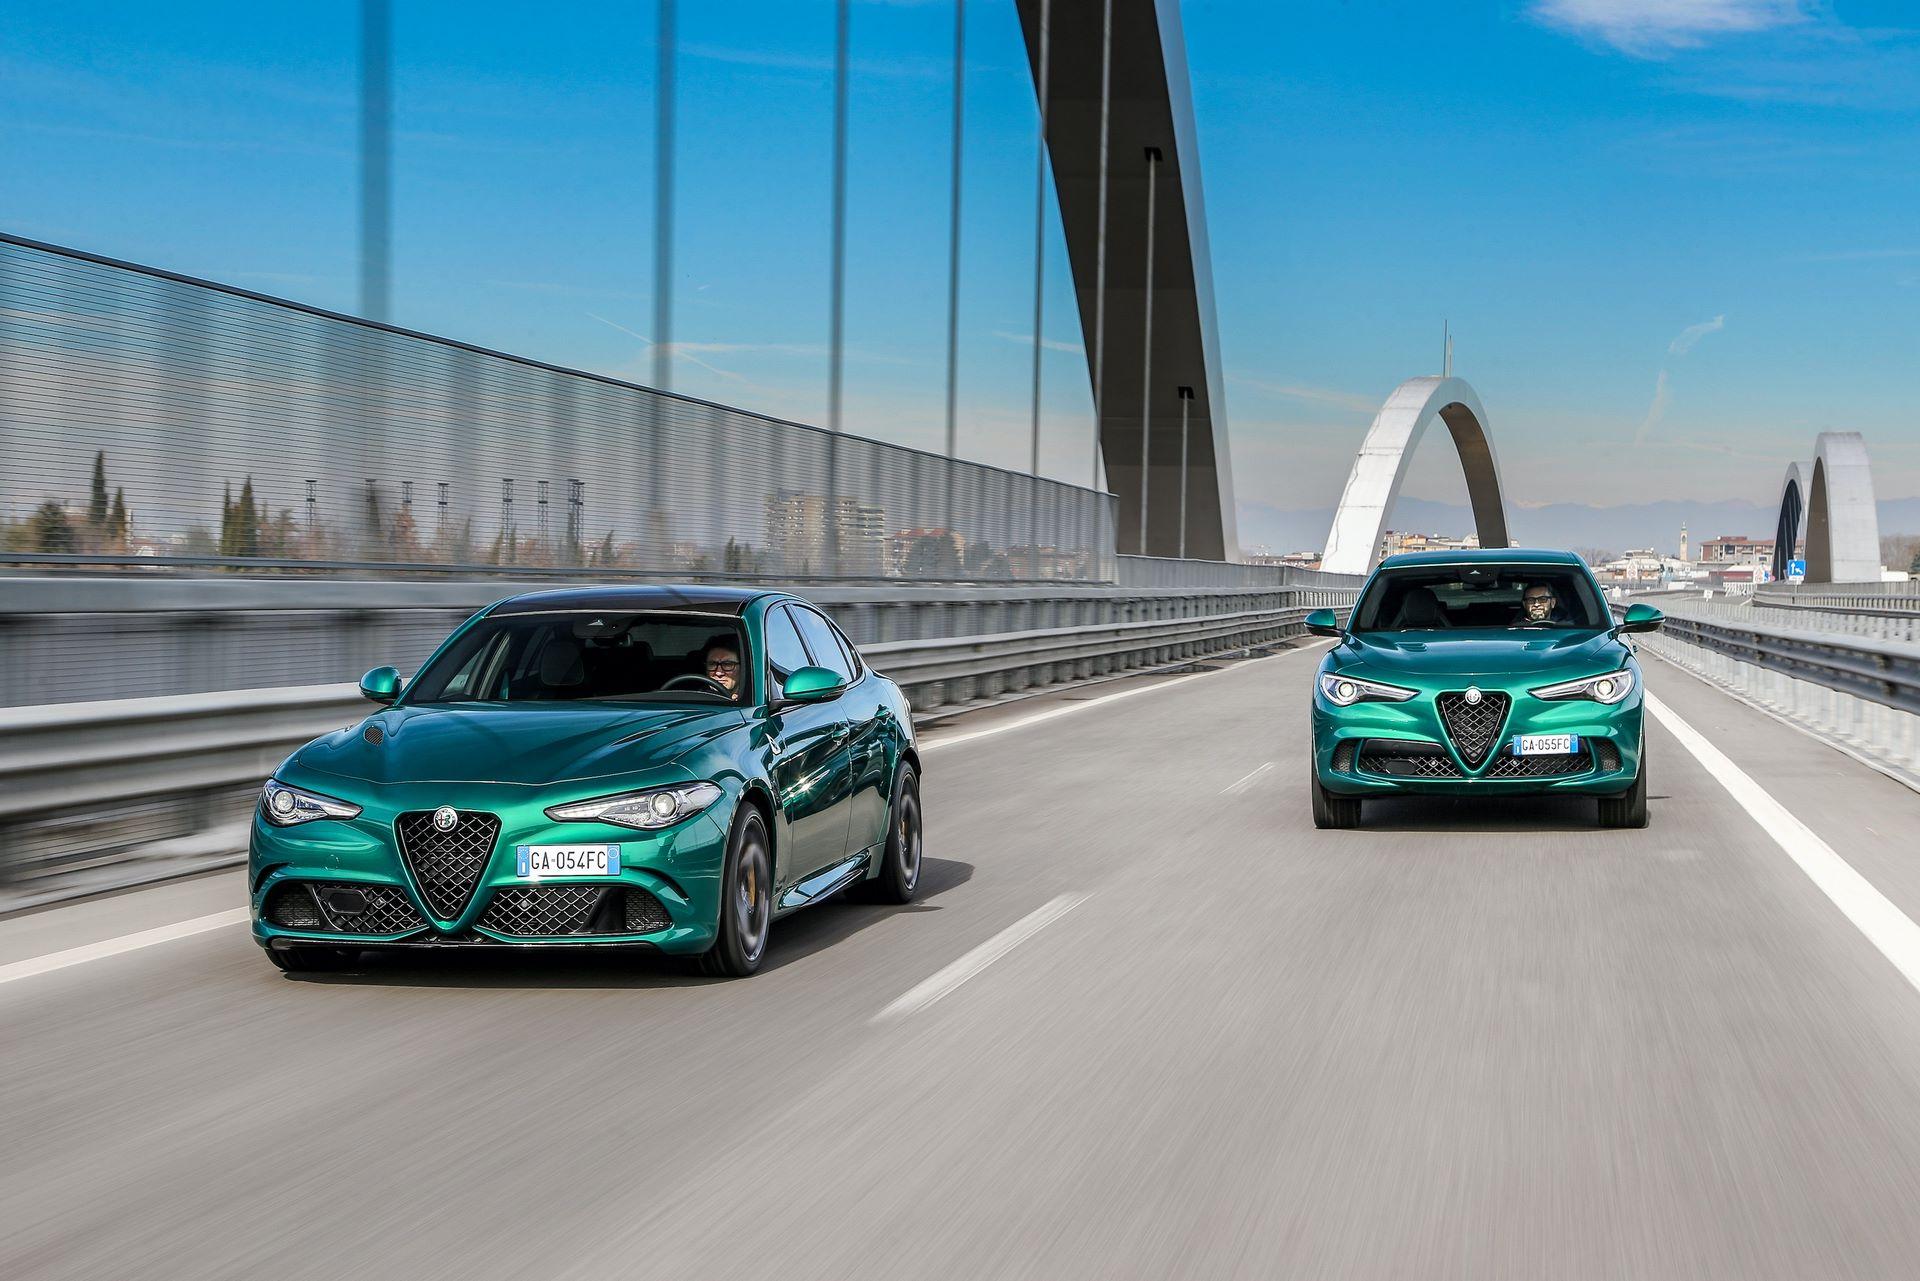 Alfa-Romeo-Giulia-Quadrifoglio-Stelvio-Quadrifoglio-facelift-2020-6